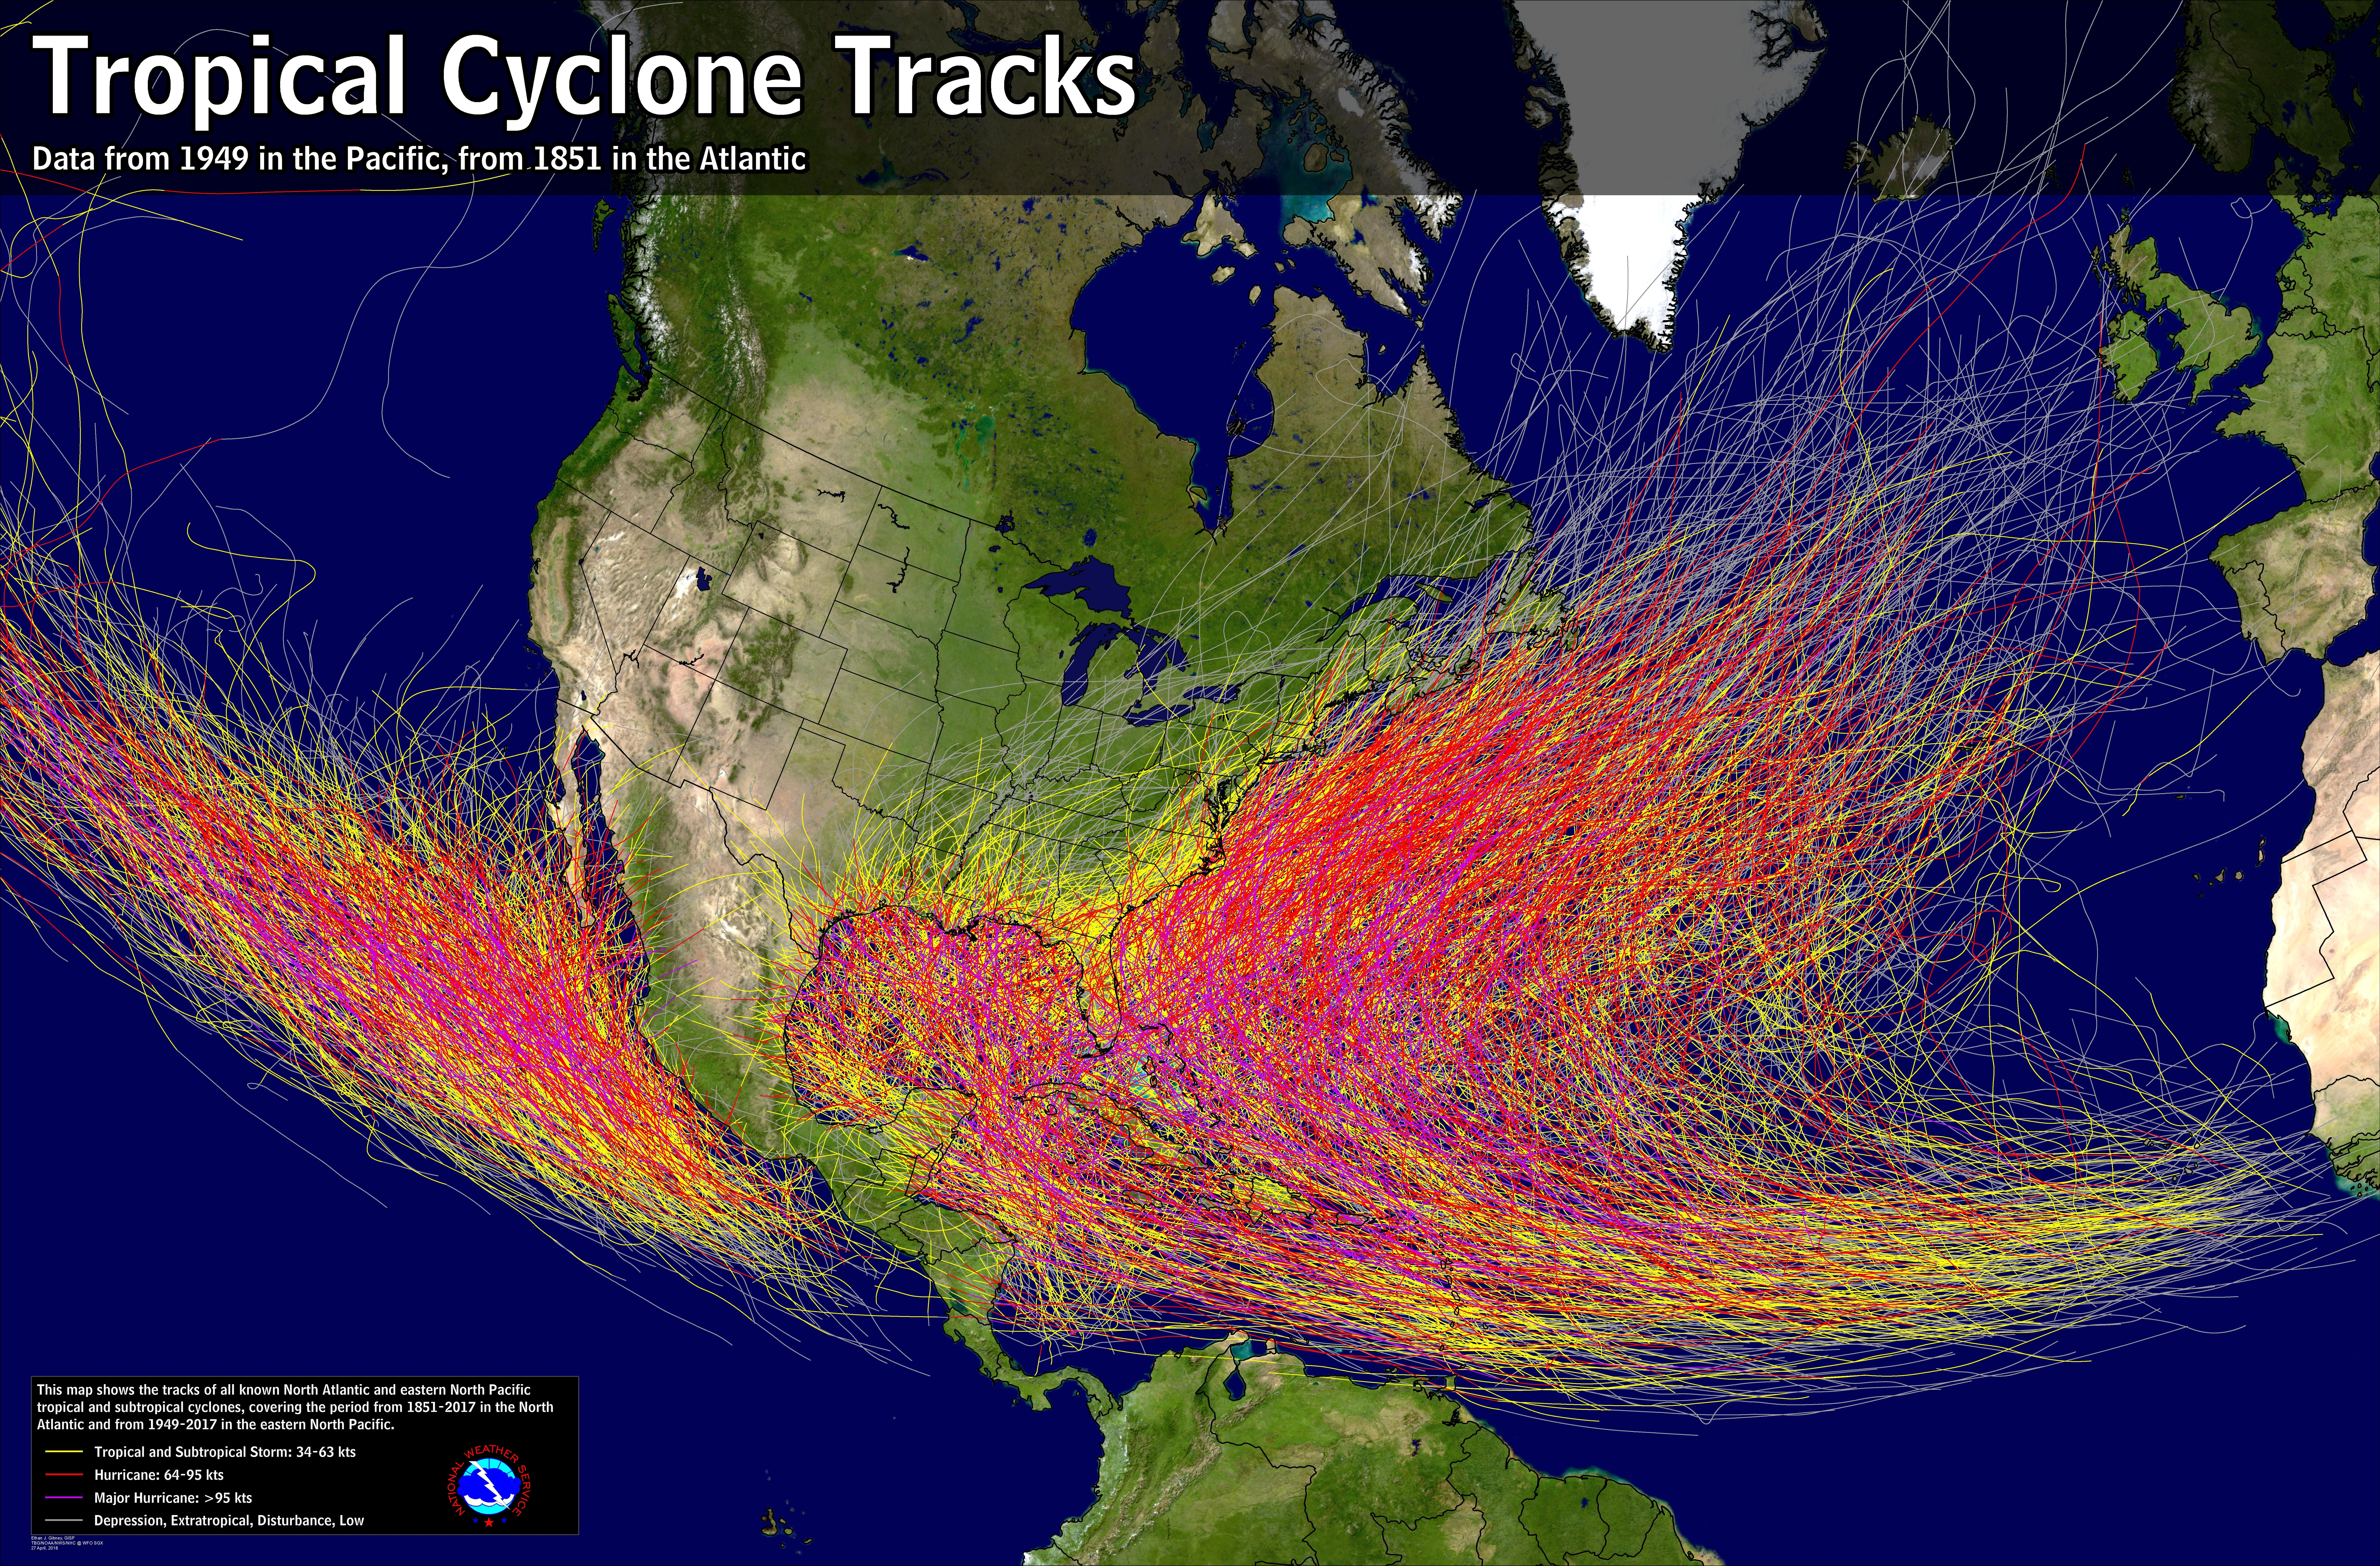 https://www.nhc.noaa.gov/climo/images/1851_2017_allstorms.jpg